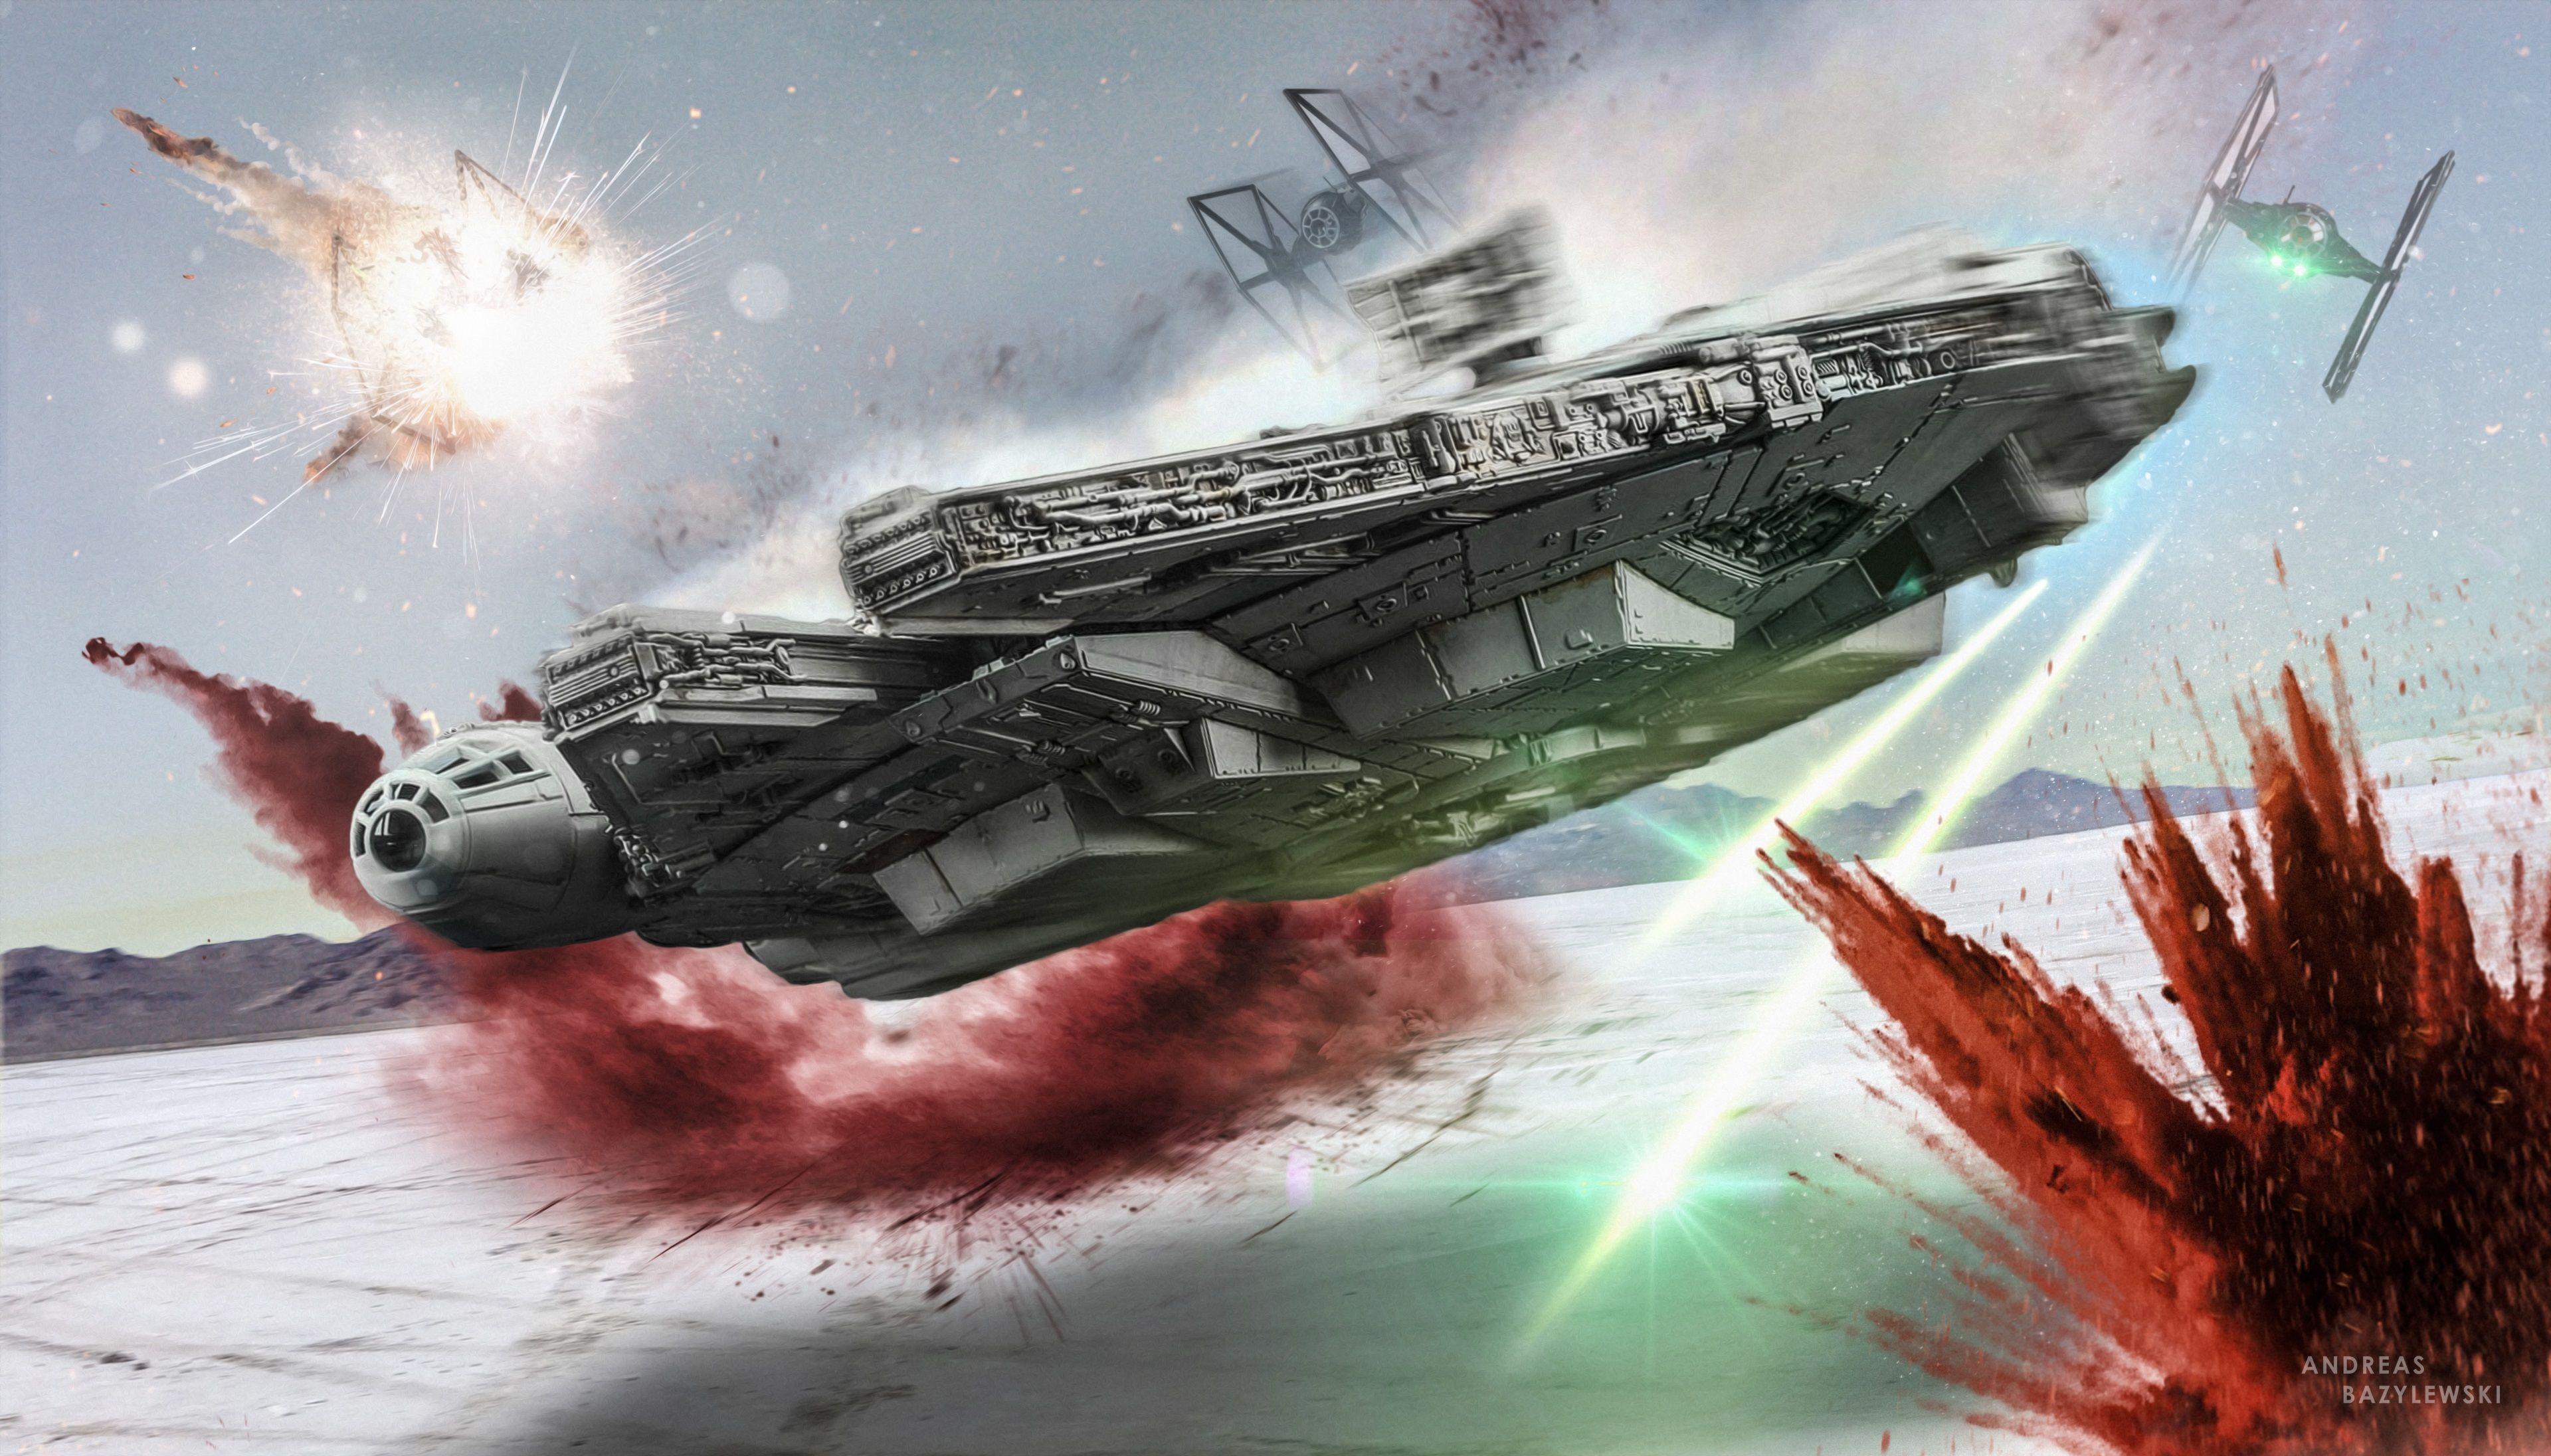 3840x2192 Star Wars The Last Jedi 4k Wallpaper Download Star Wars Spaceships Millennium Falcon Star Wars Wallpaper